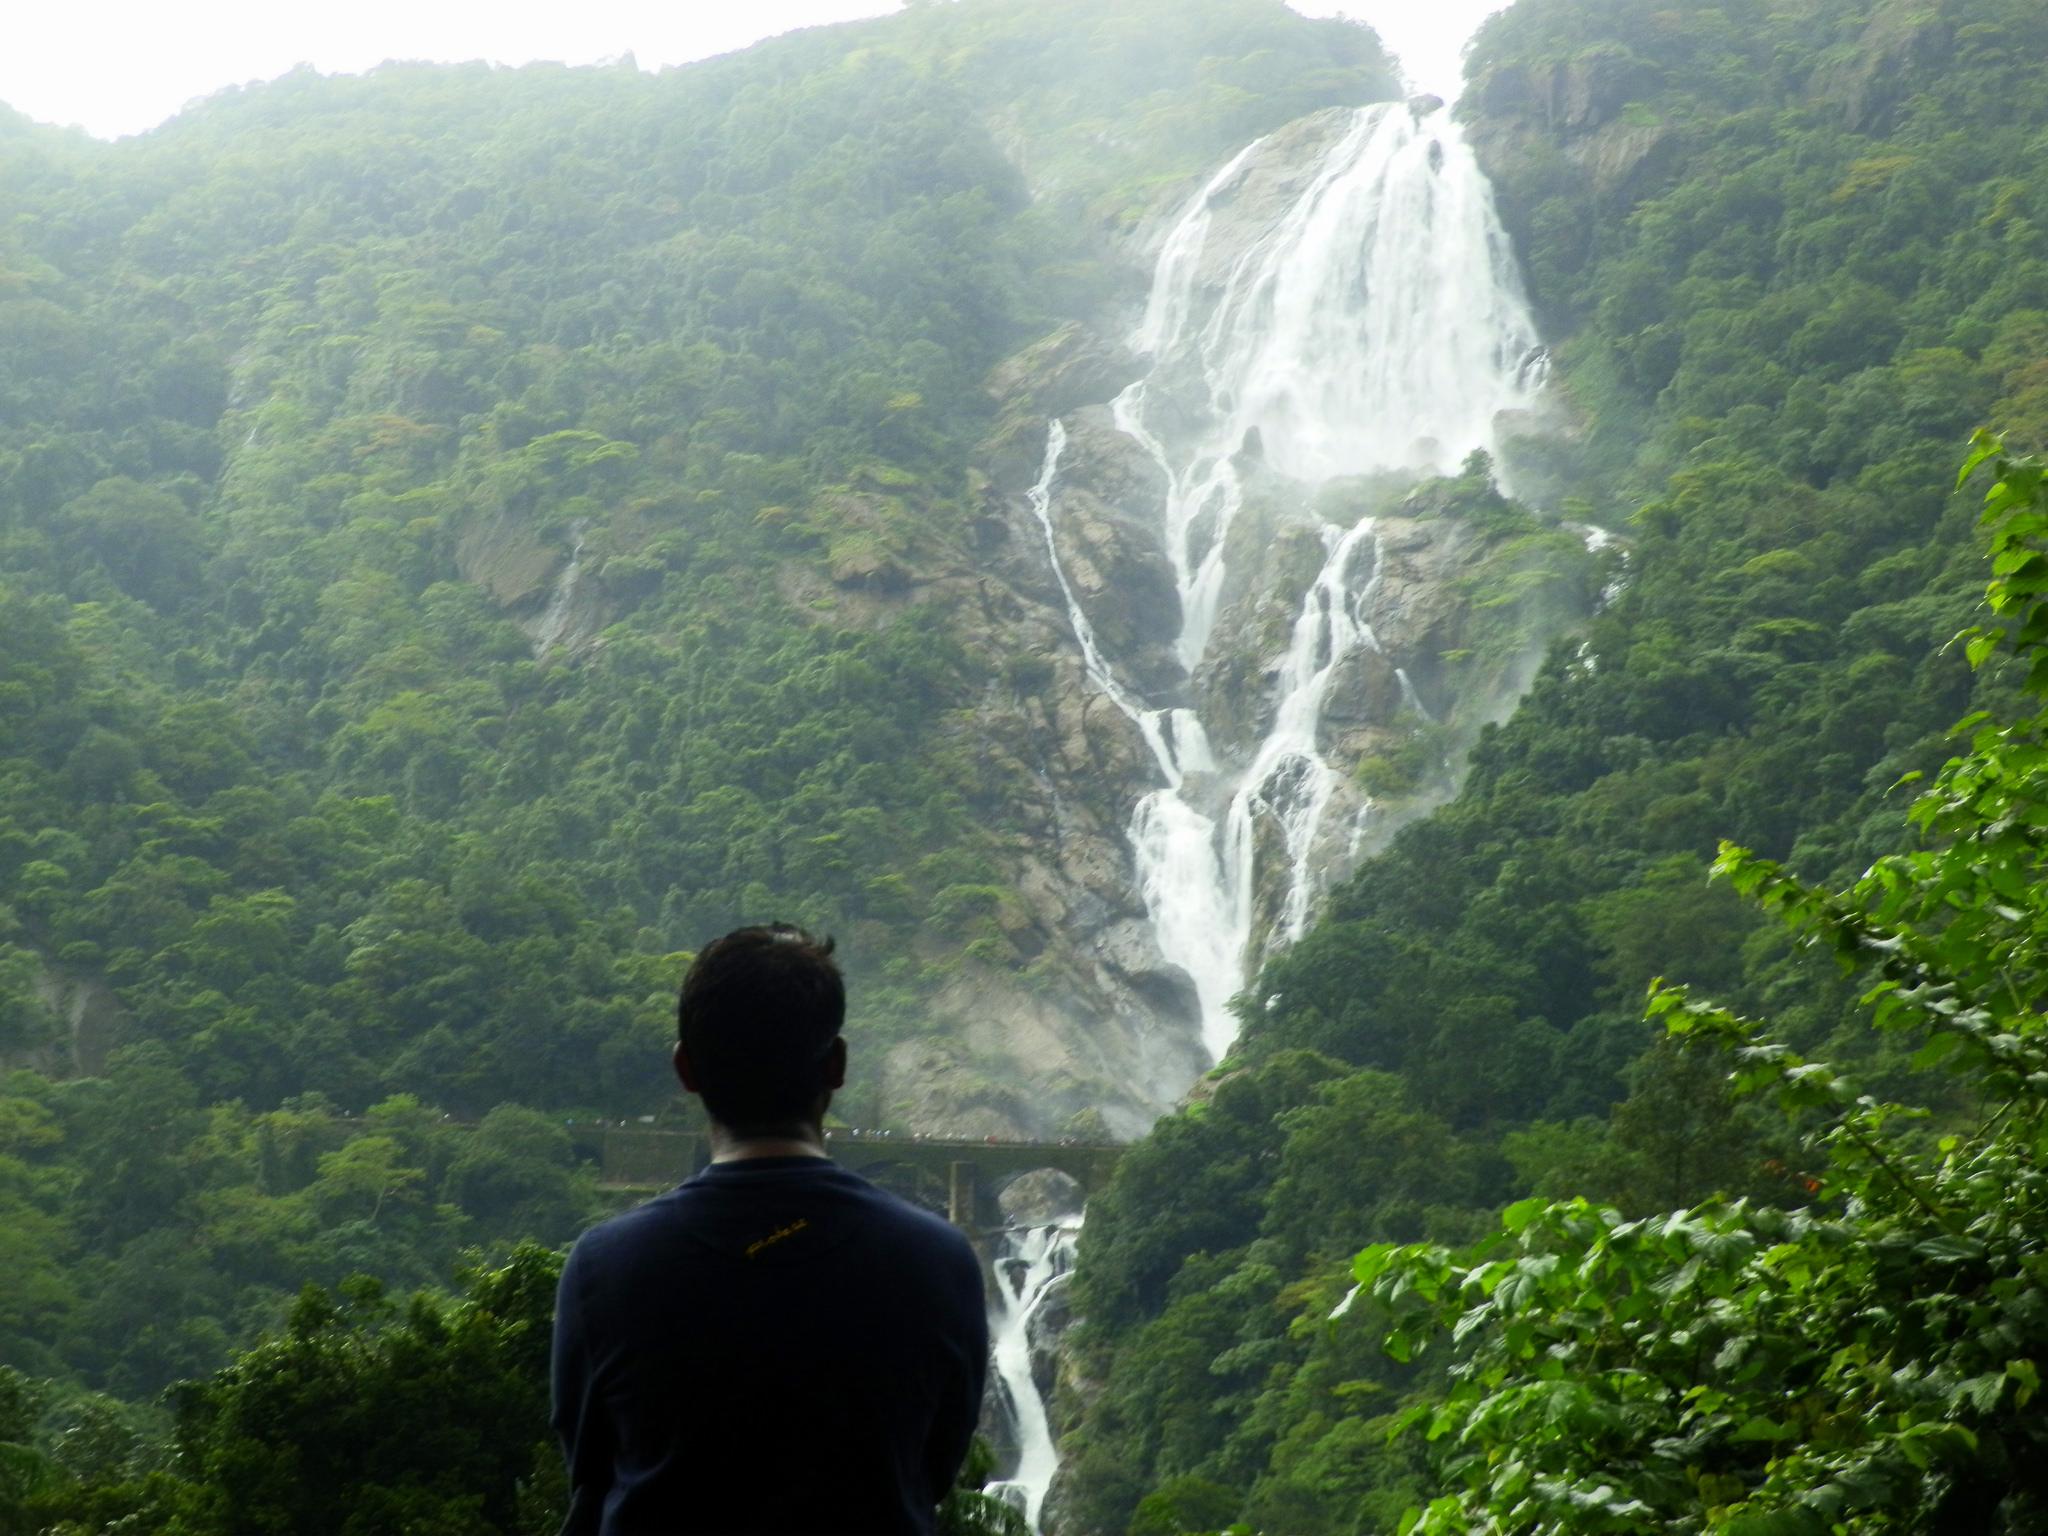 Турист, наблюдающий за водопадом Дудхсагар, Индия